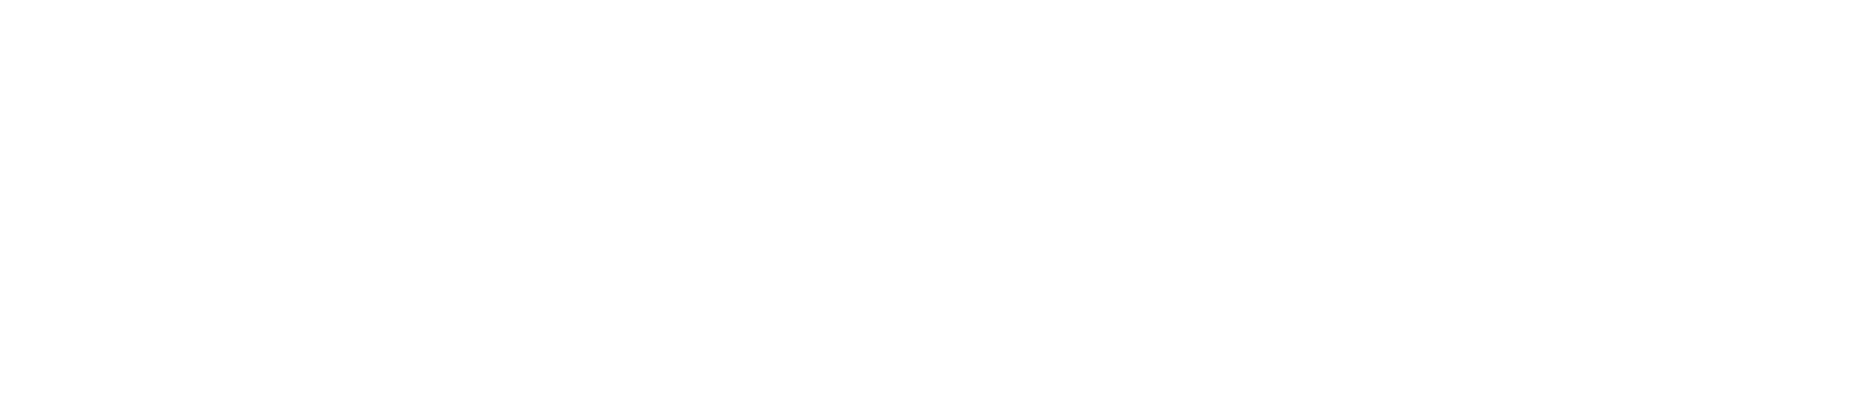 Curtin Team Cares logo.